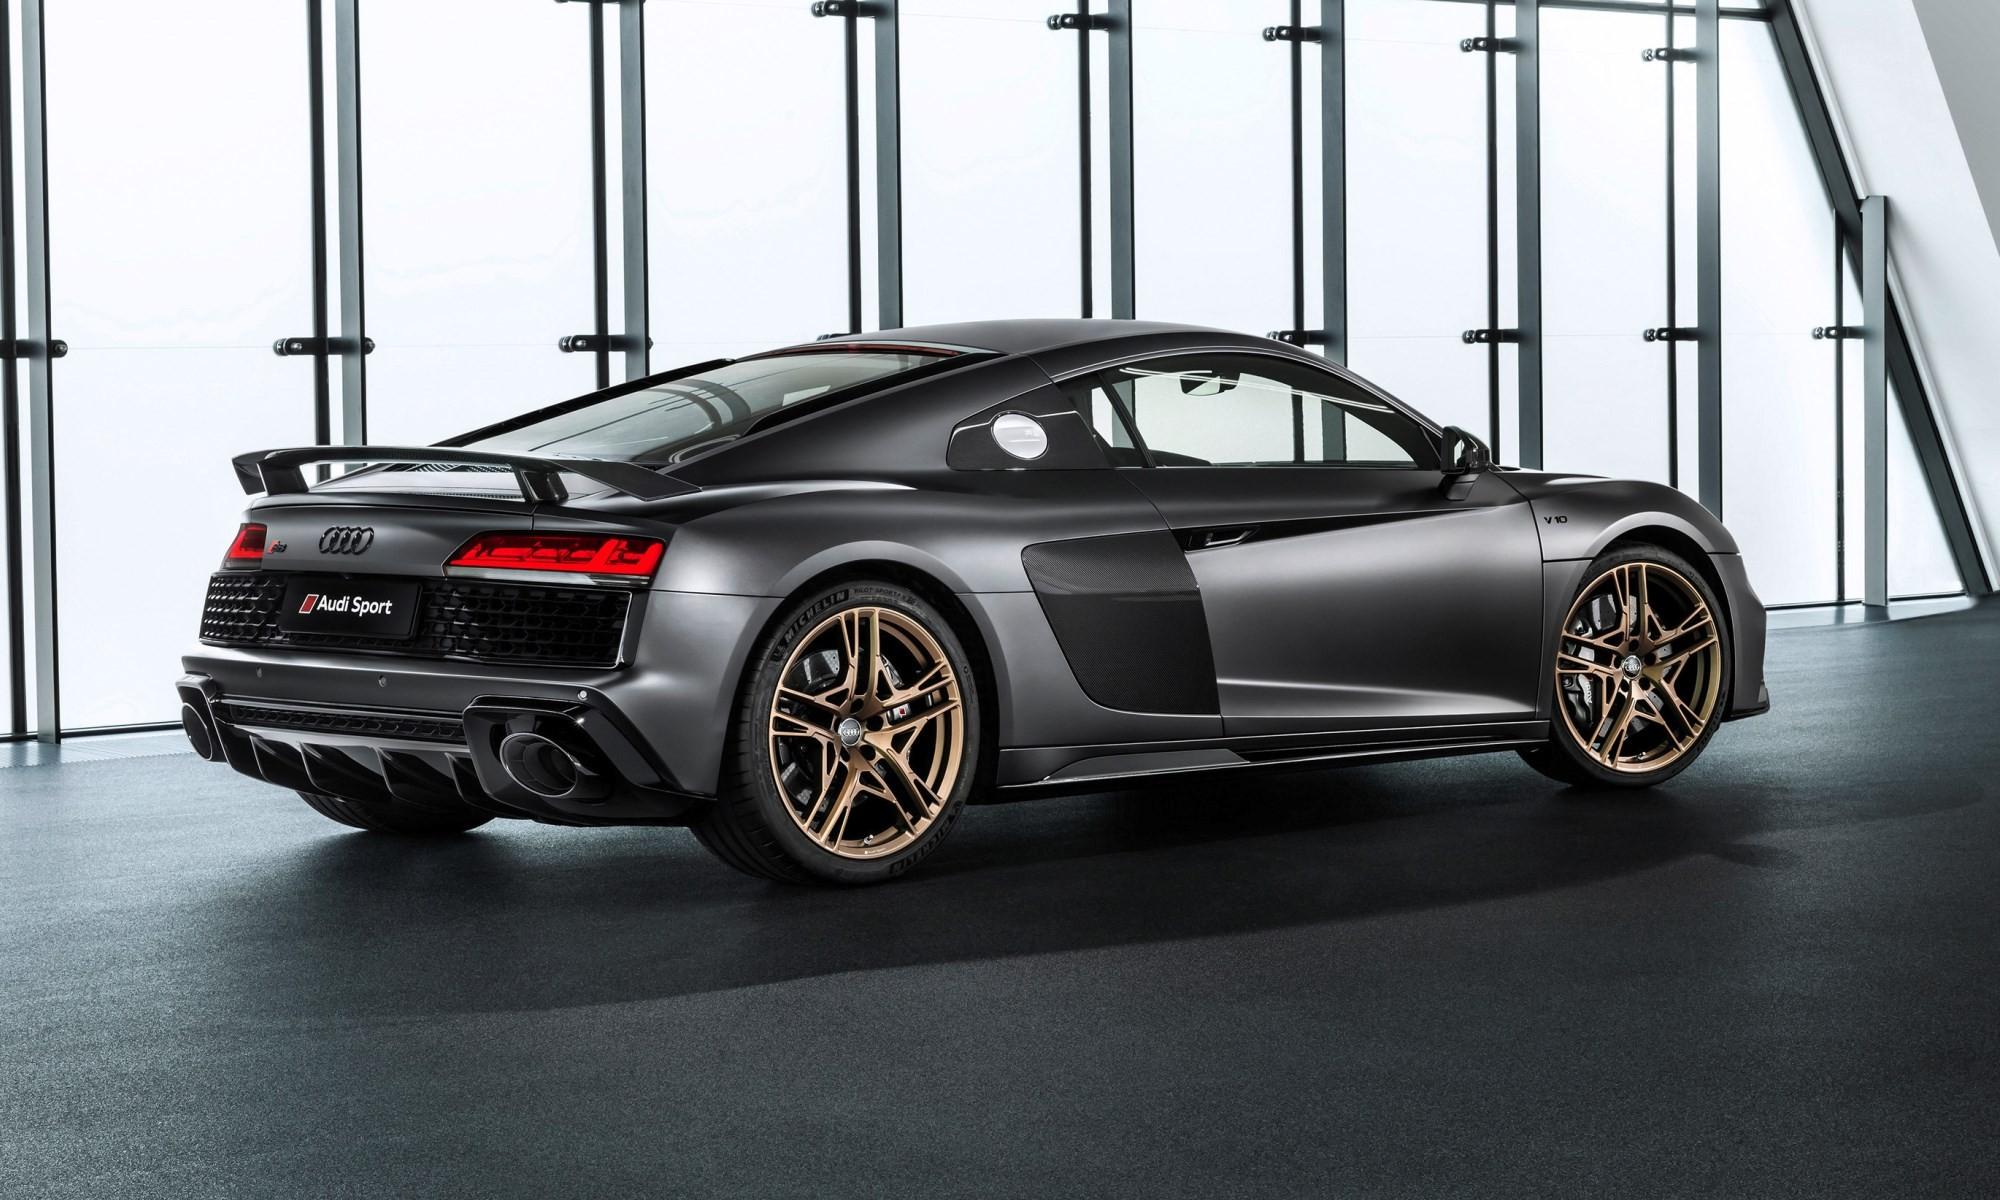 Audi R8 V10 Decennium rear